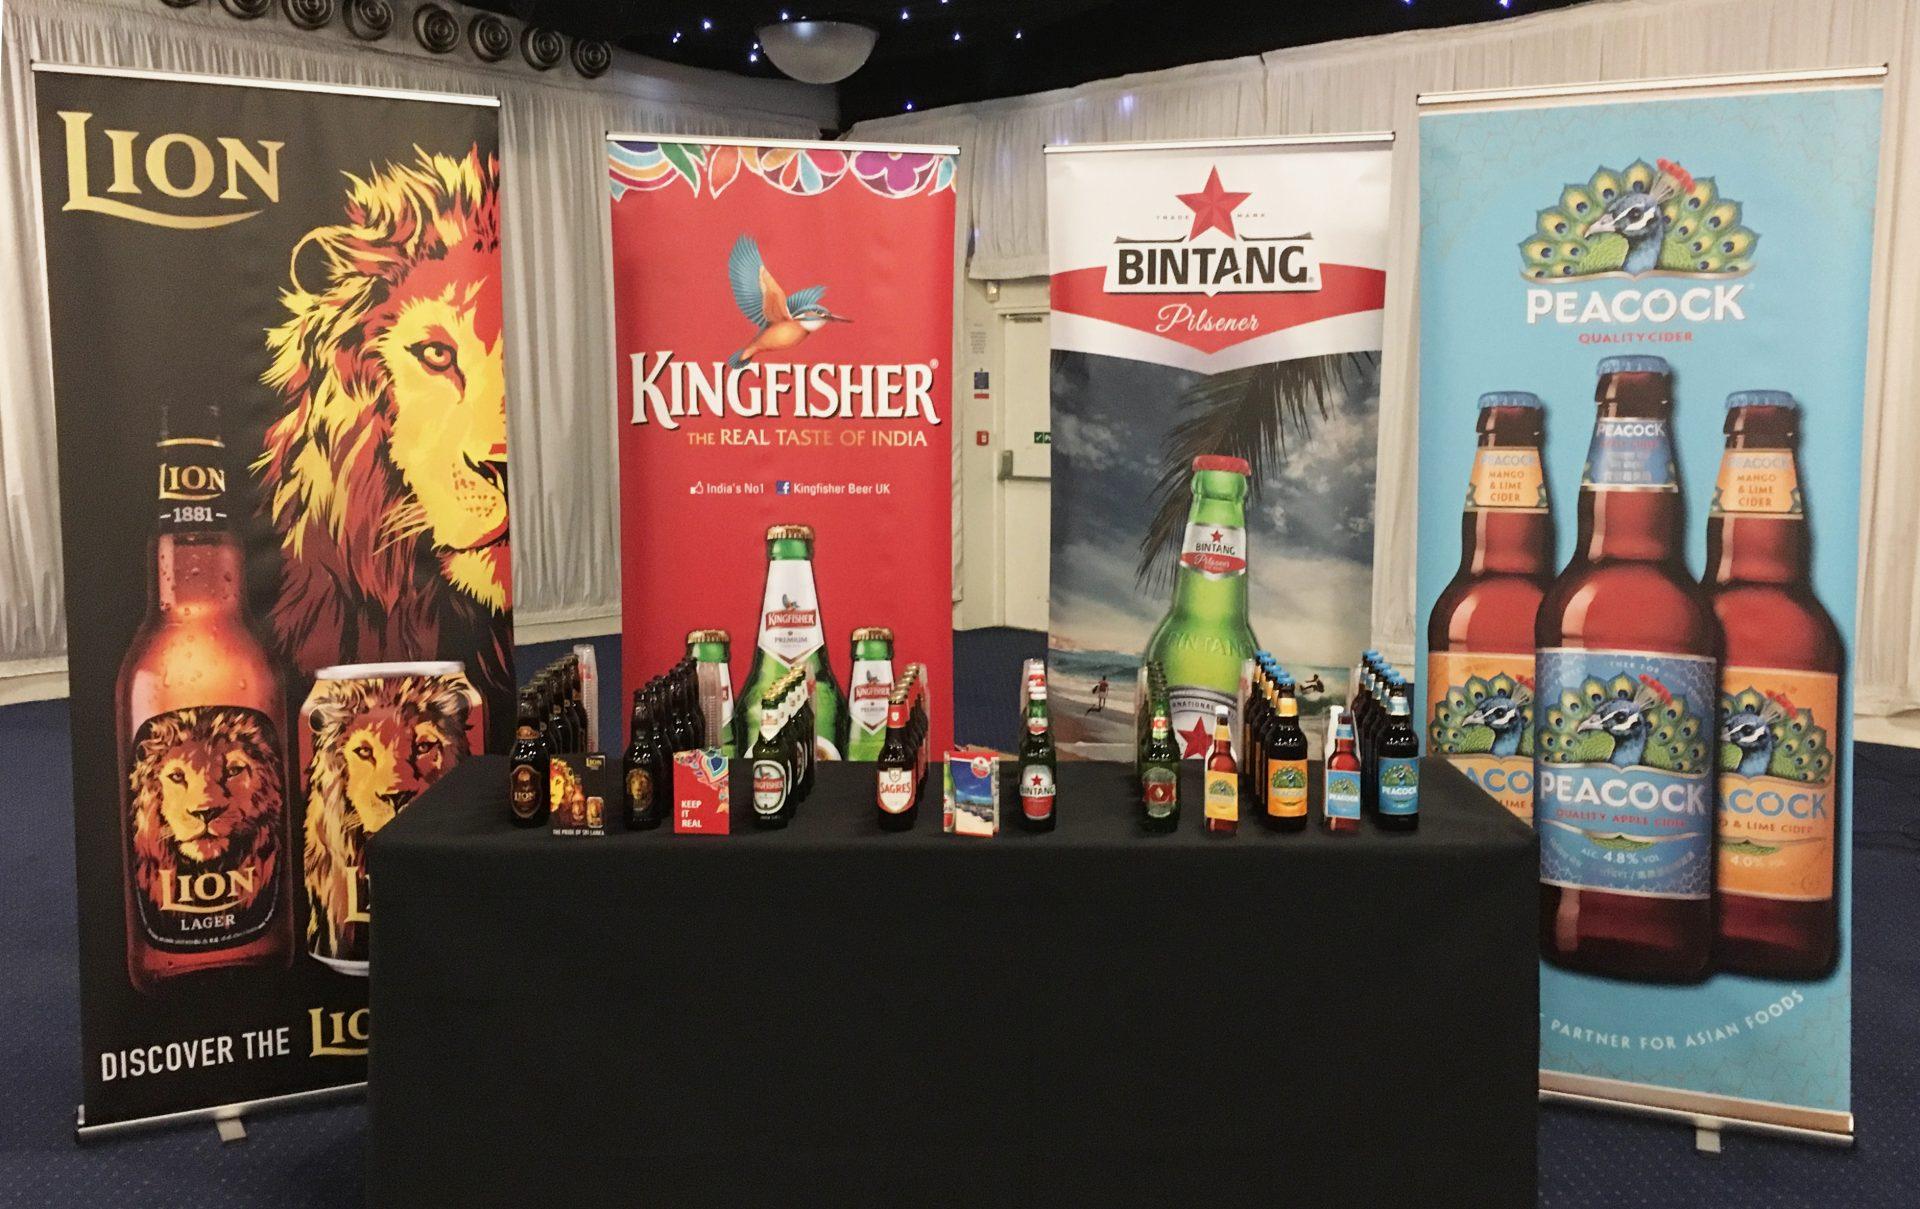 KBE Sponsor the 2018 Yorkshire Post Oliver Awards